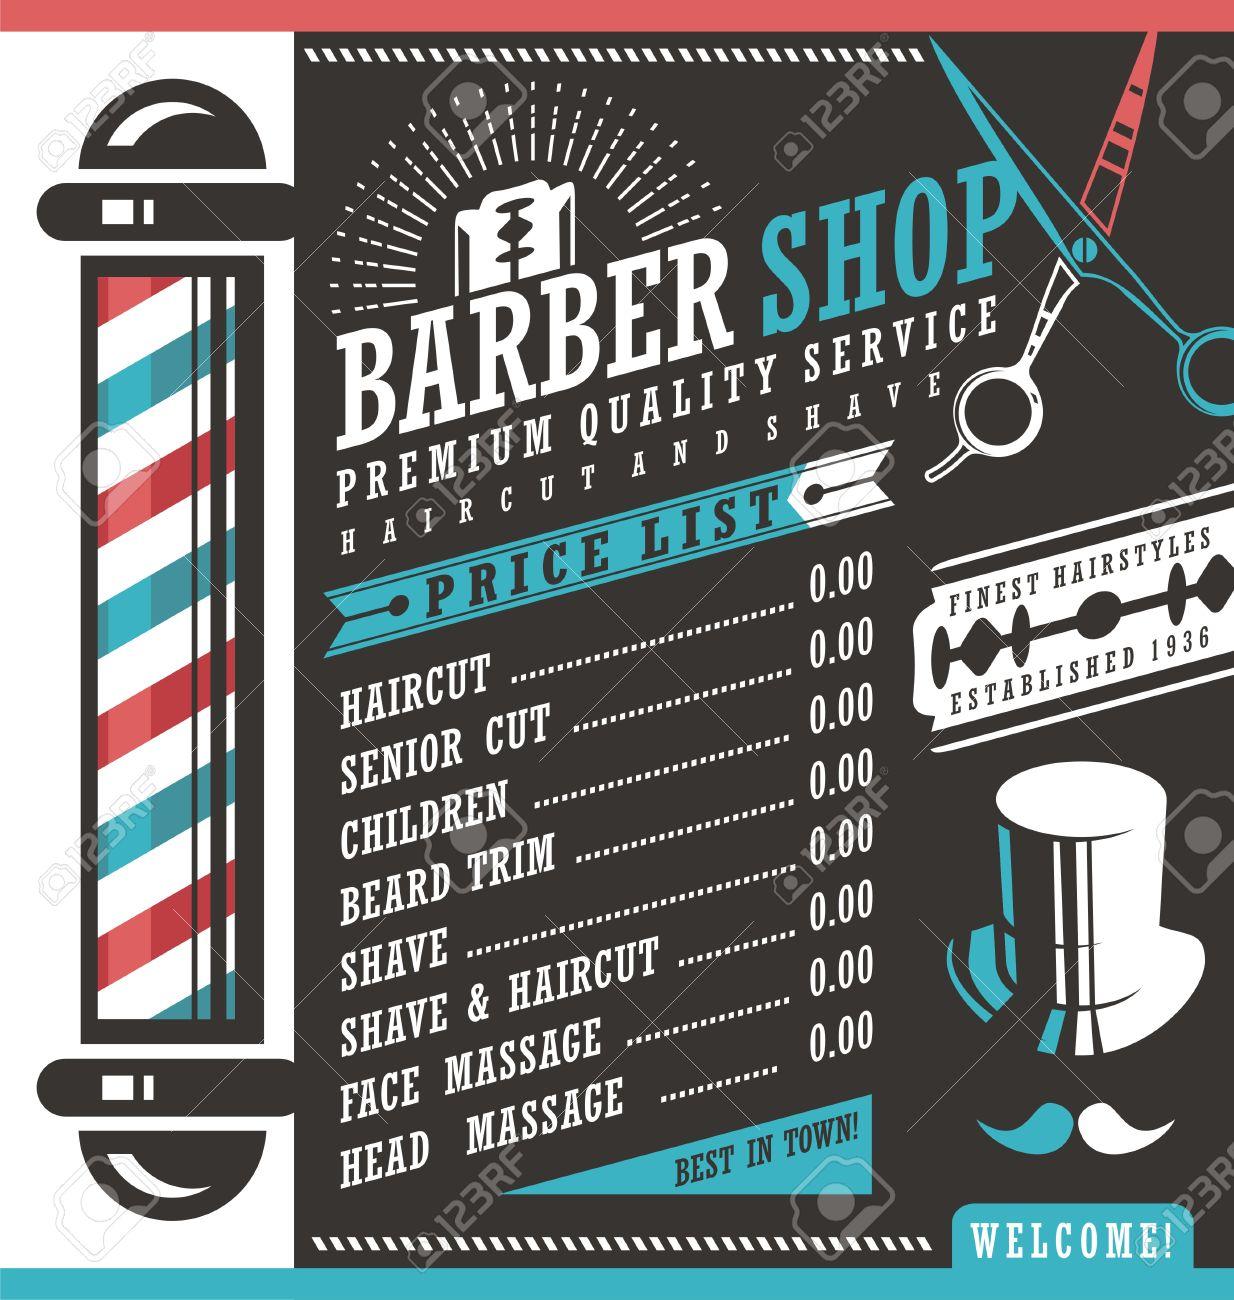 Free Barbershop Business Plan Template Criticismlearnersgq - Free barbershop business plan template